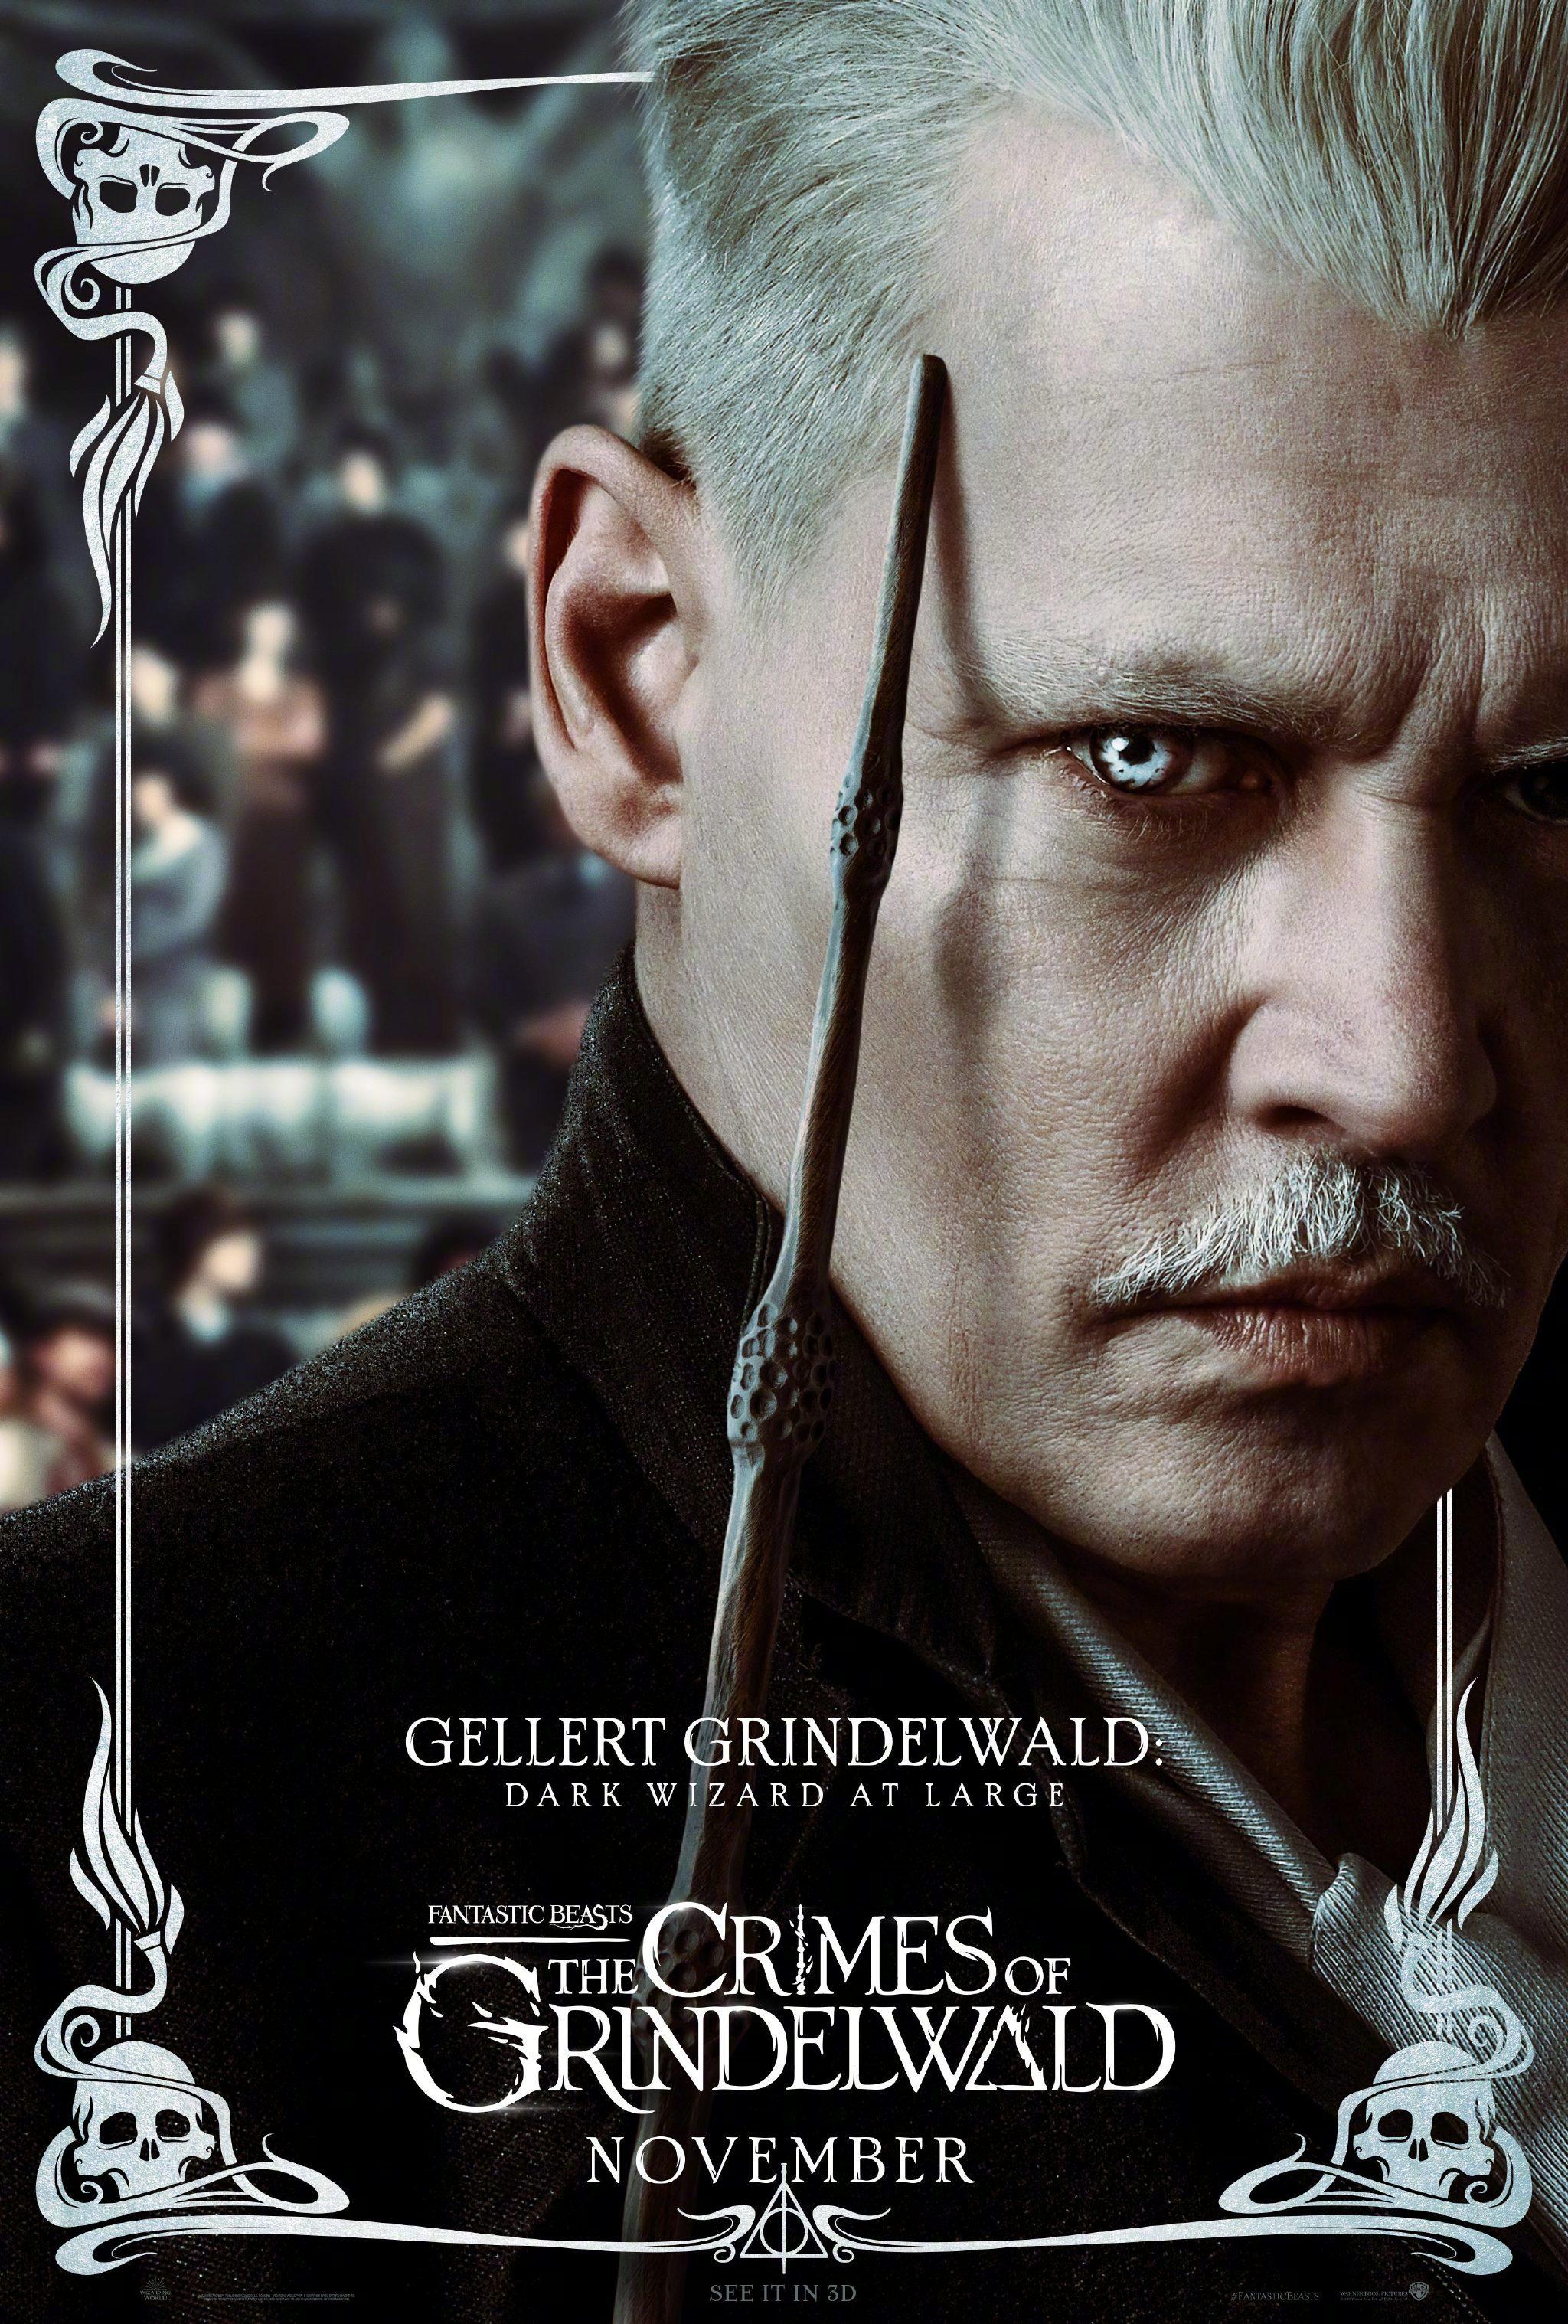 Download Fantastic Beasts The Crimes Of Grindelwald